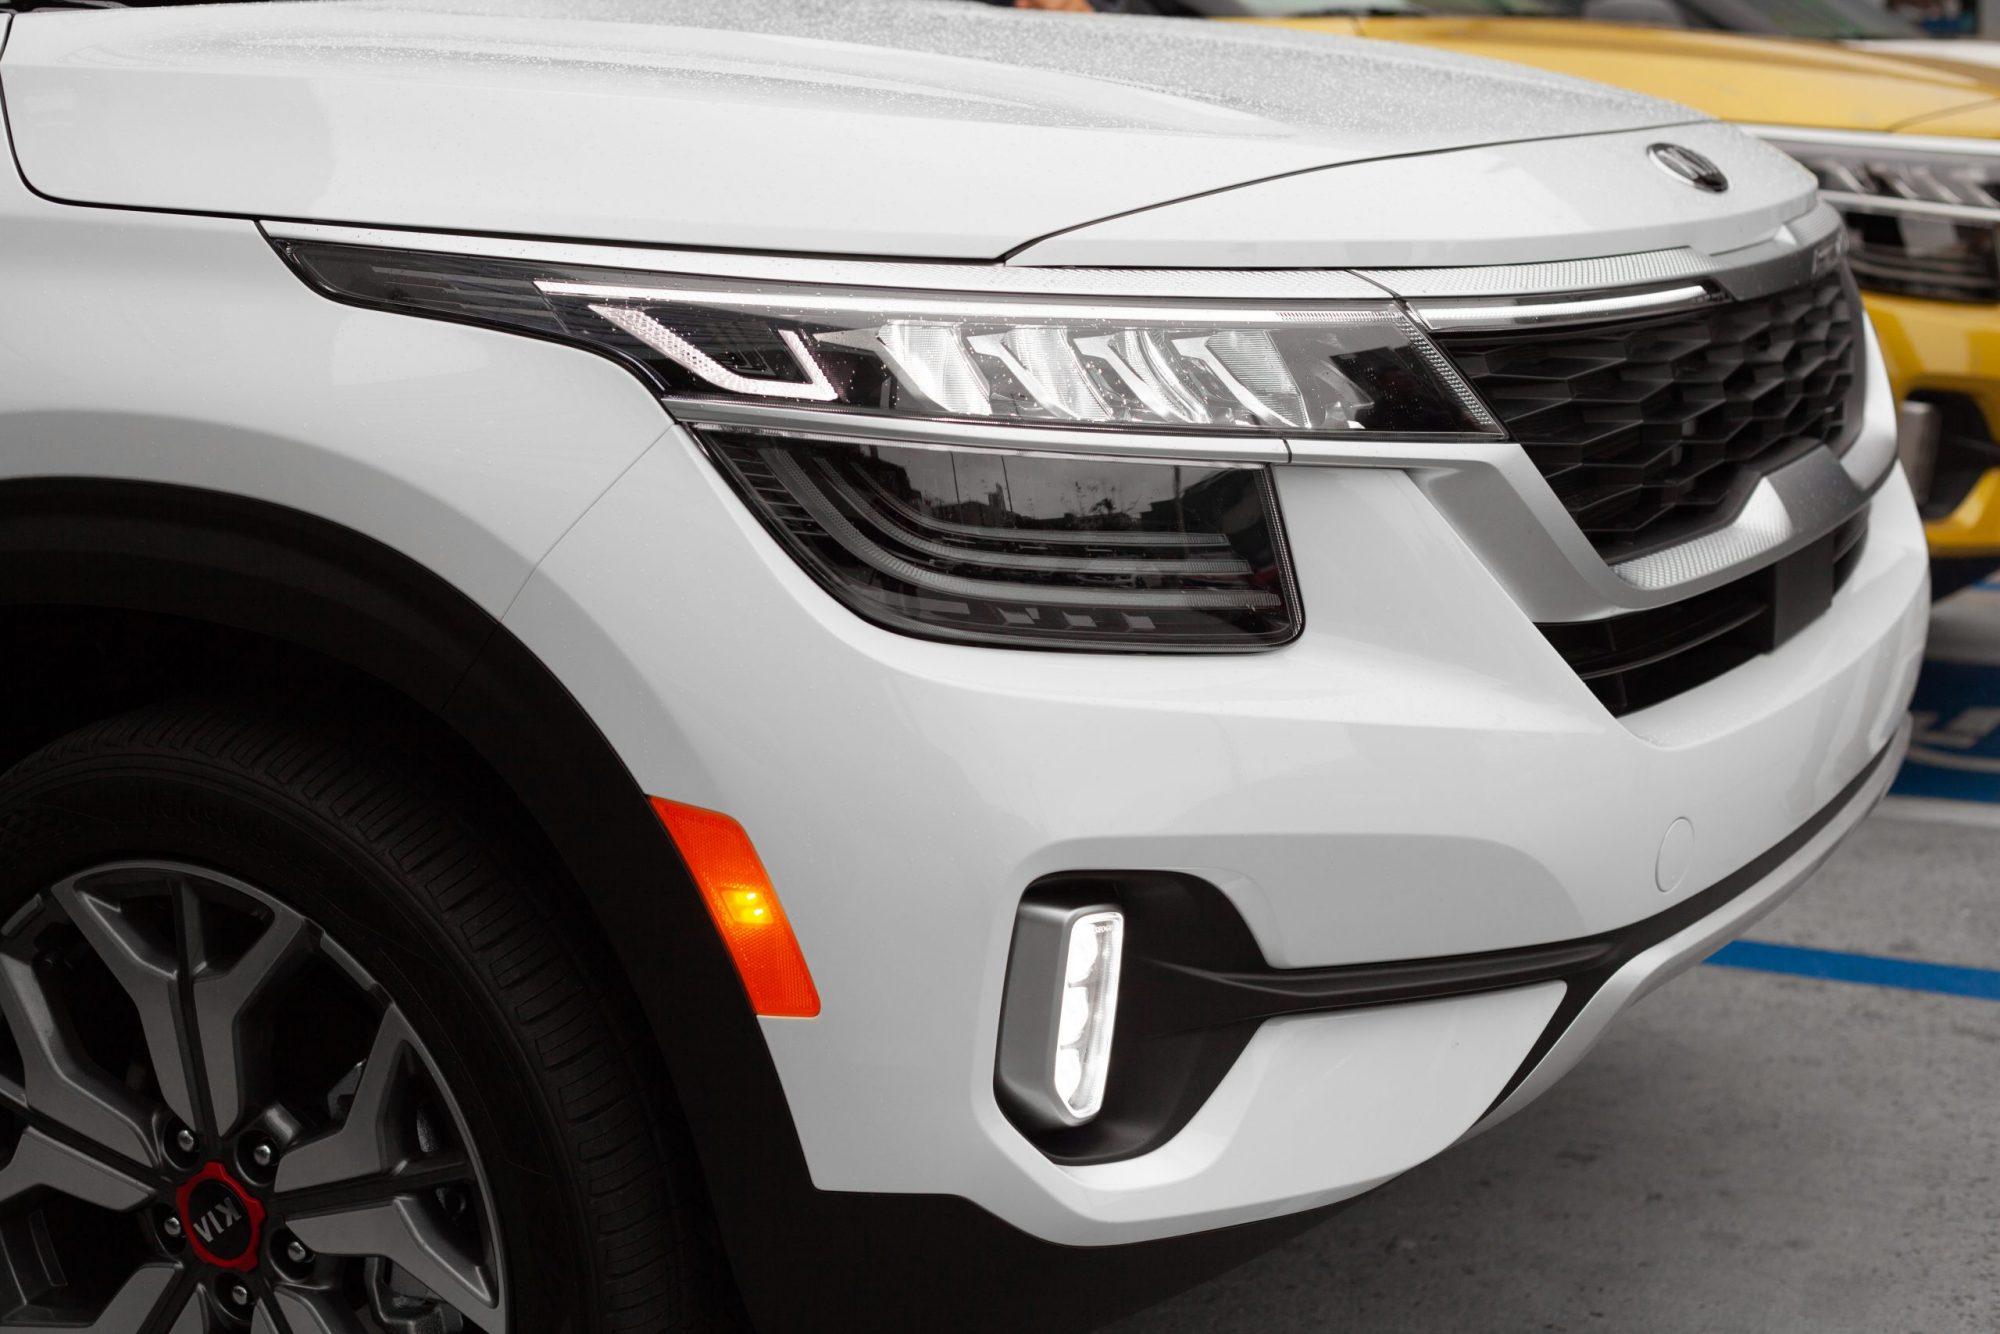 Exterior of 2021 Kia Seltos SUV